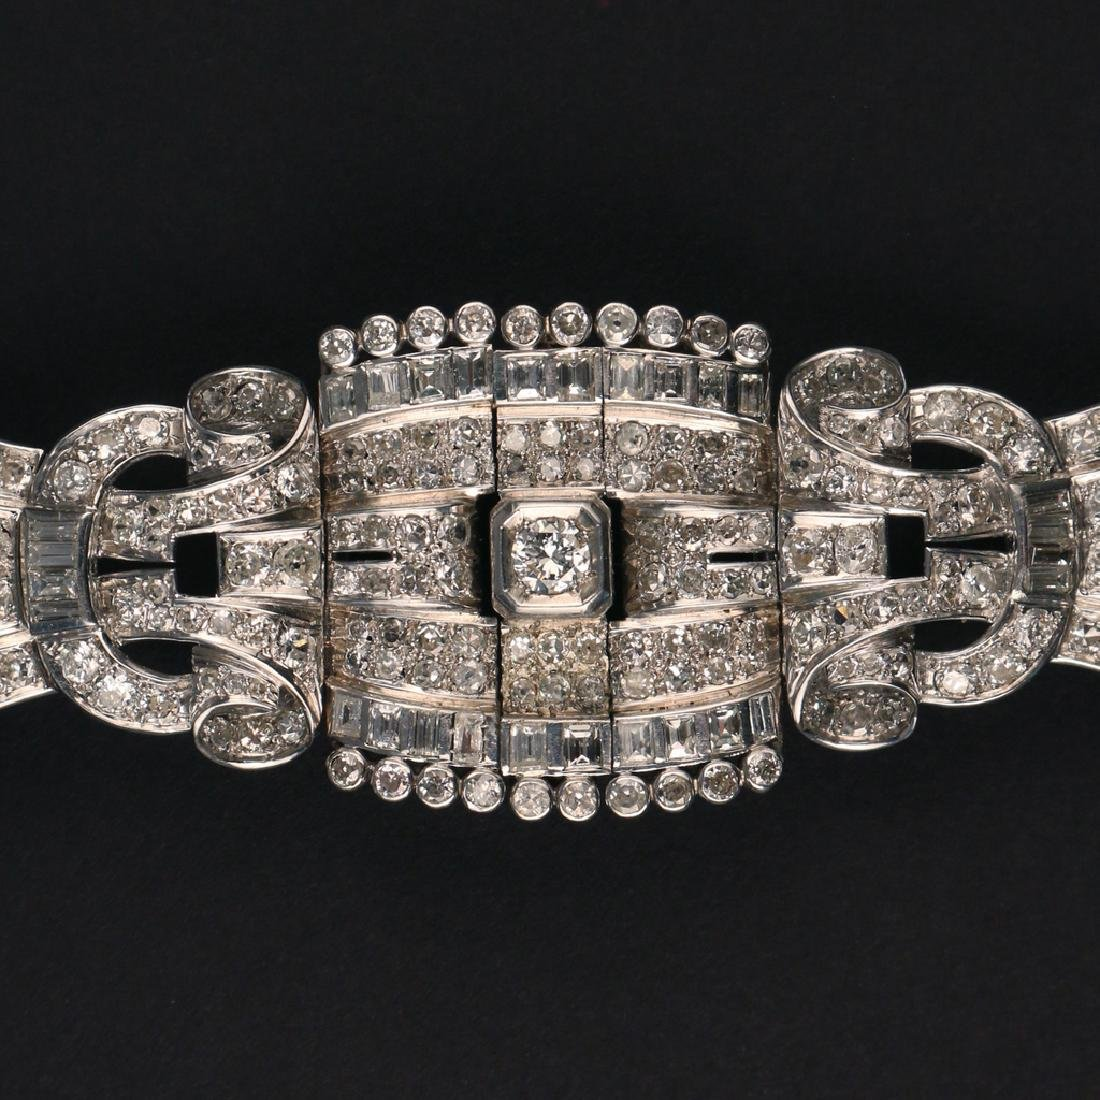 FRENCH RIBBON-FORM DIAMOND BRACELET - 3